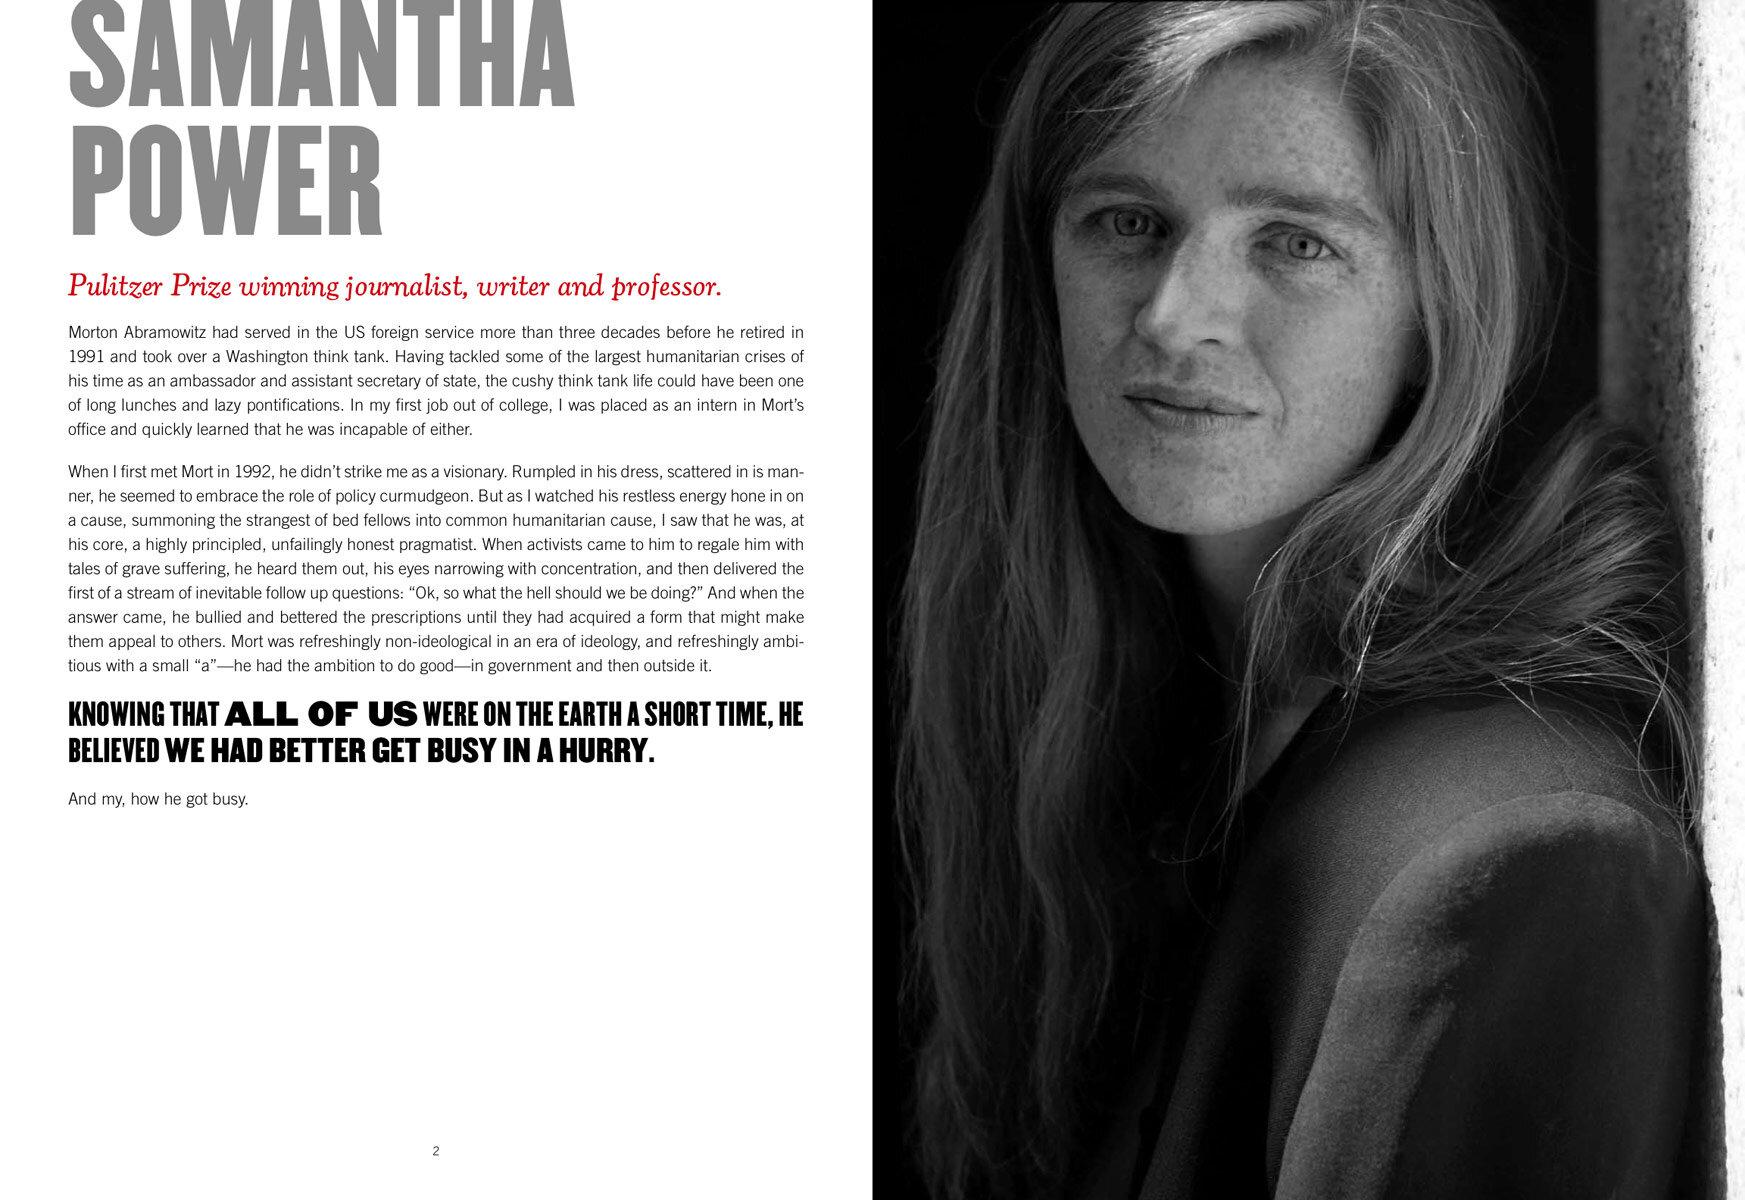 3-Mentors-Samantha-Power-tsar-fedorsky.jpg